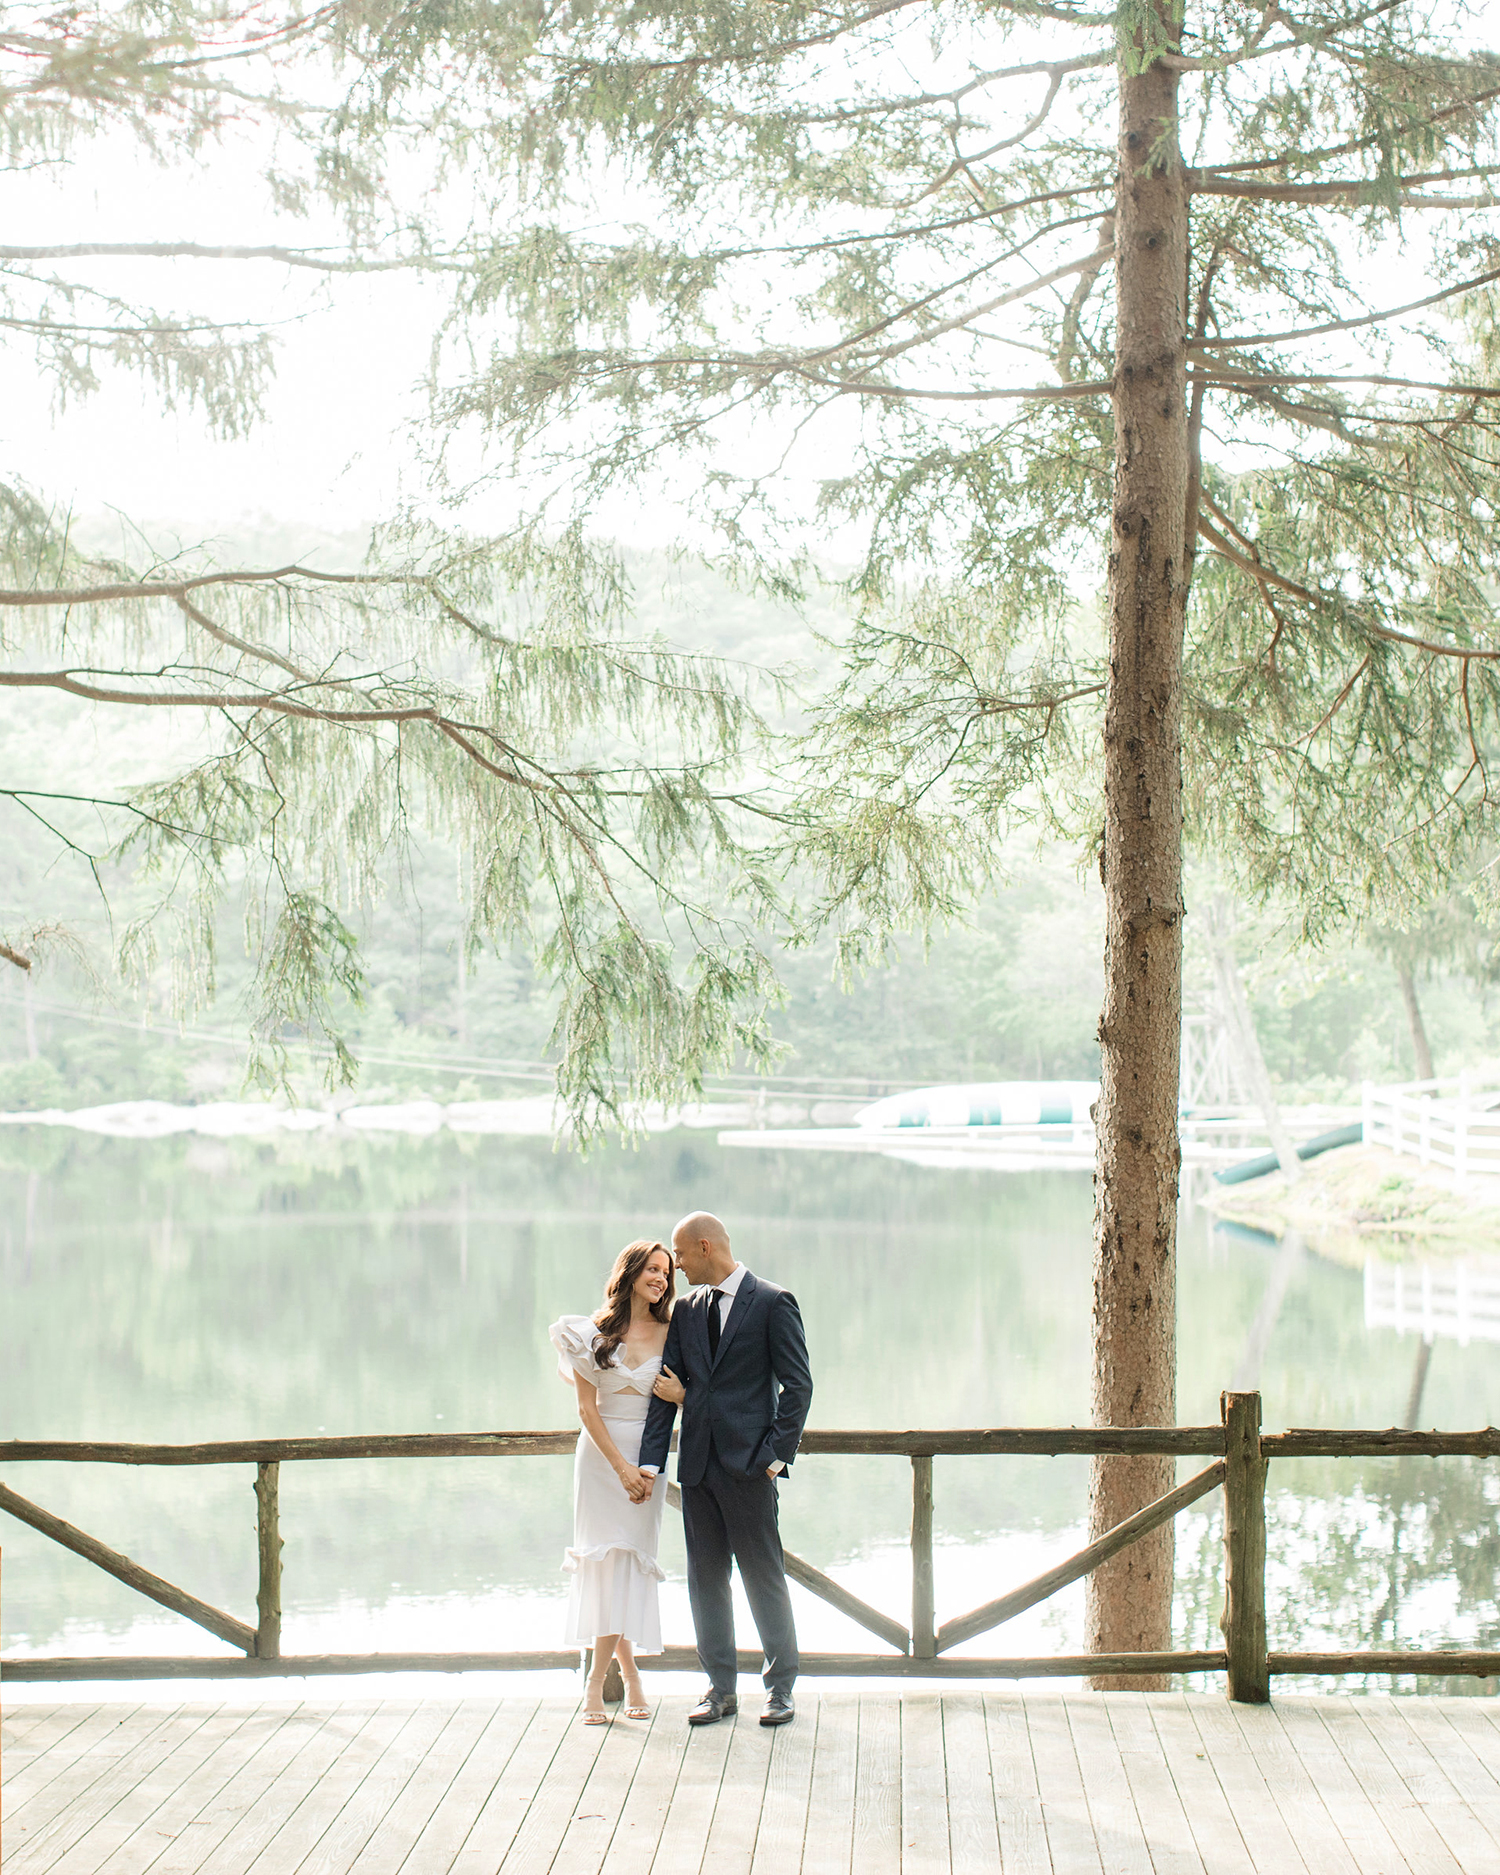 camryn eugene couple near water